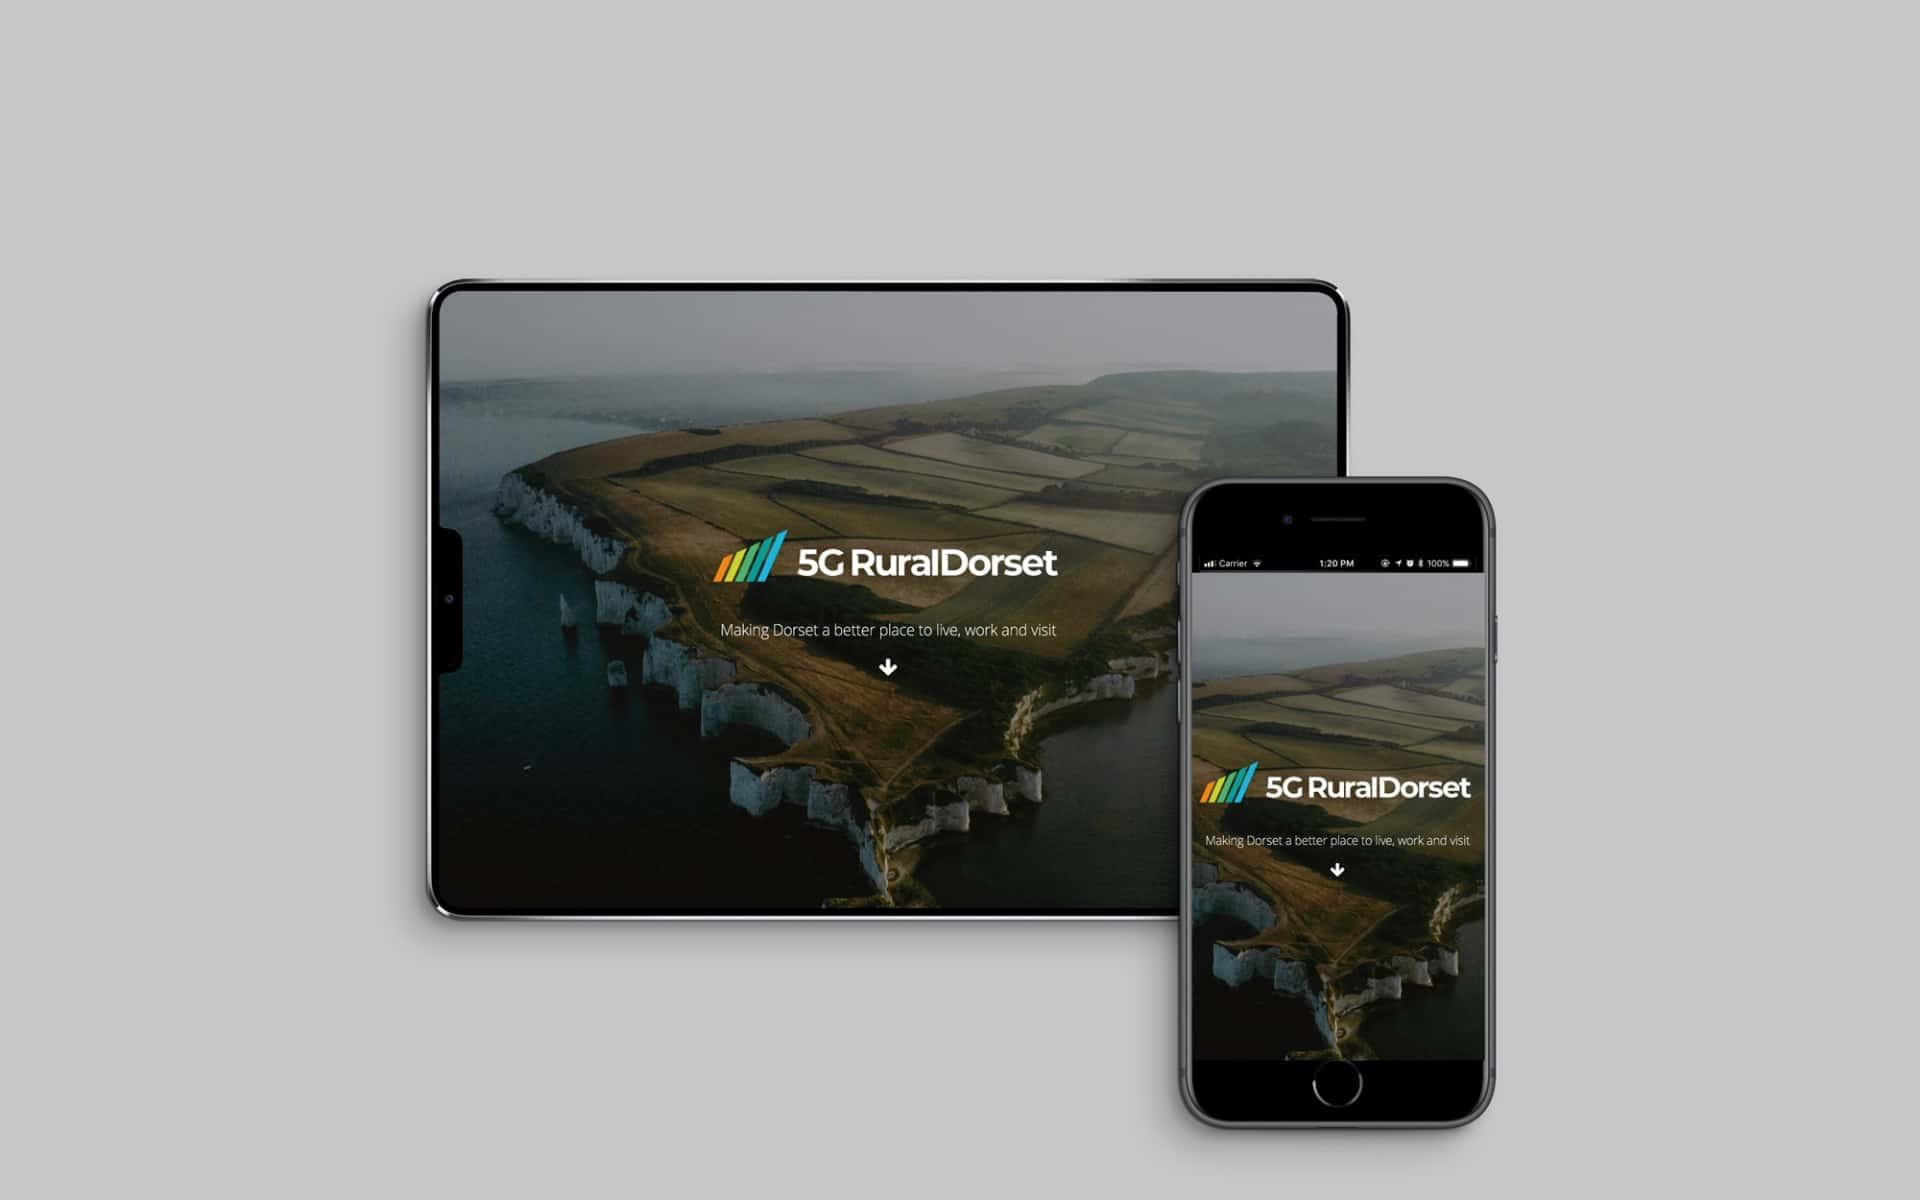 5G Rural Dorset mobile website - Home